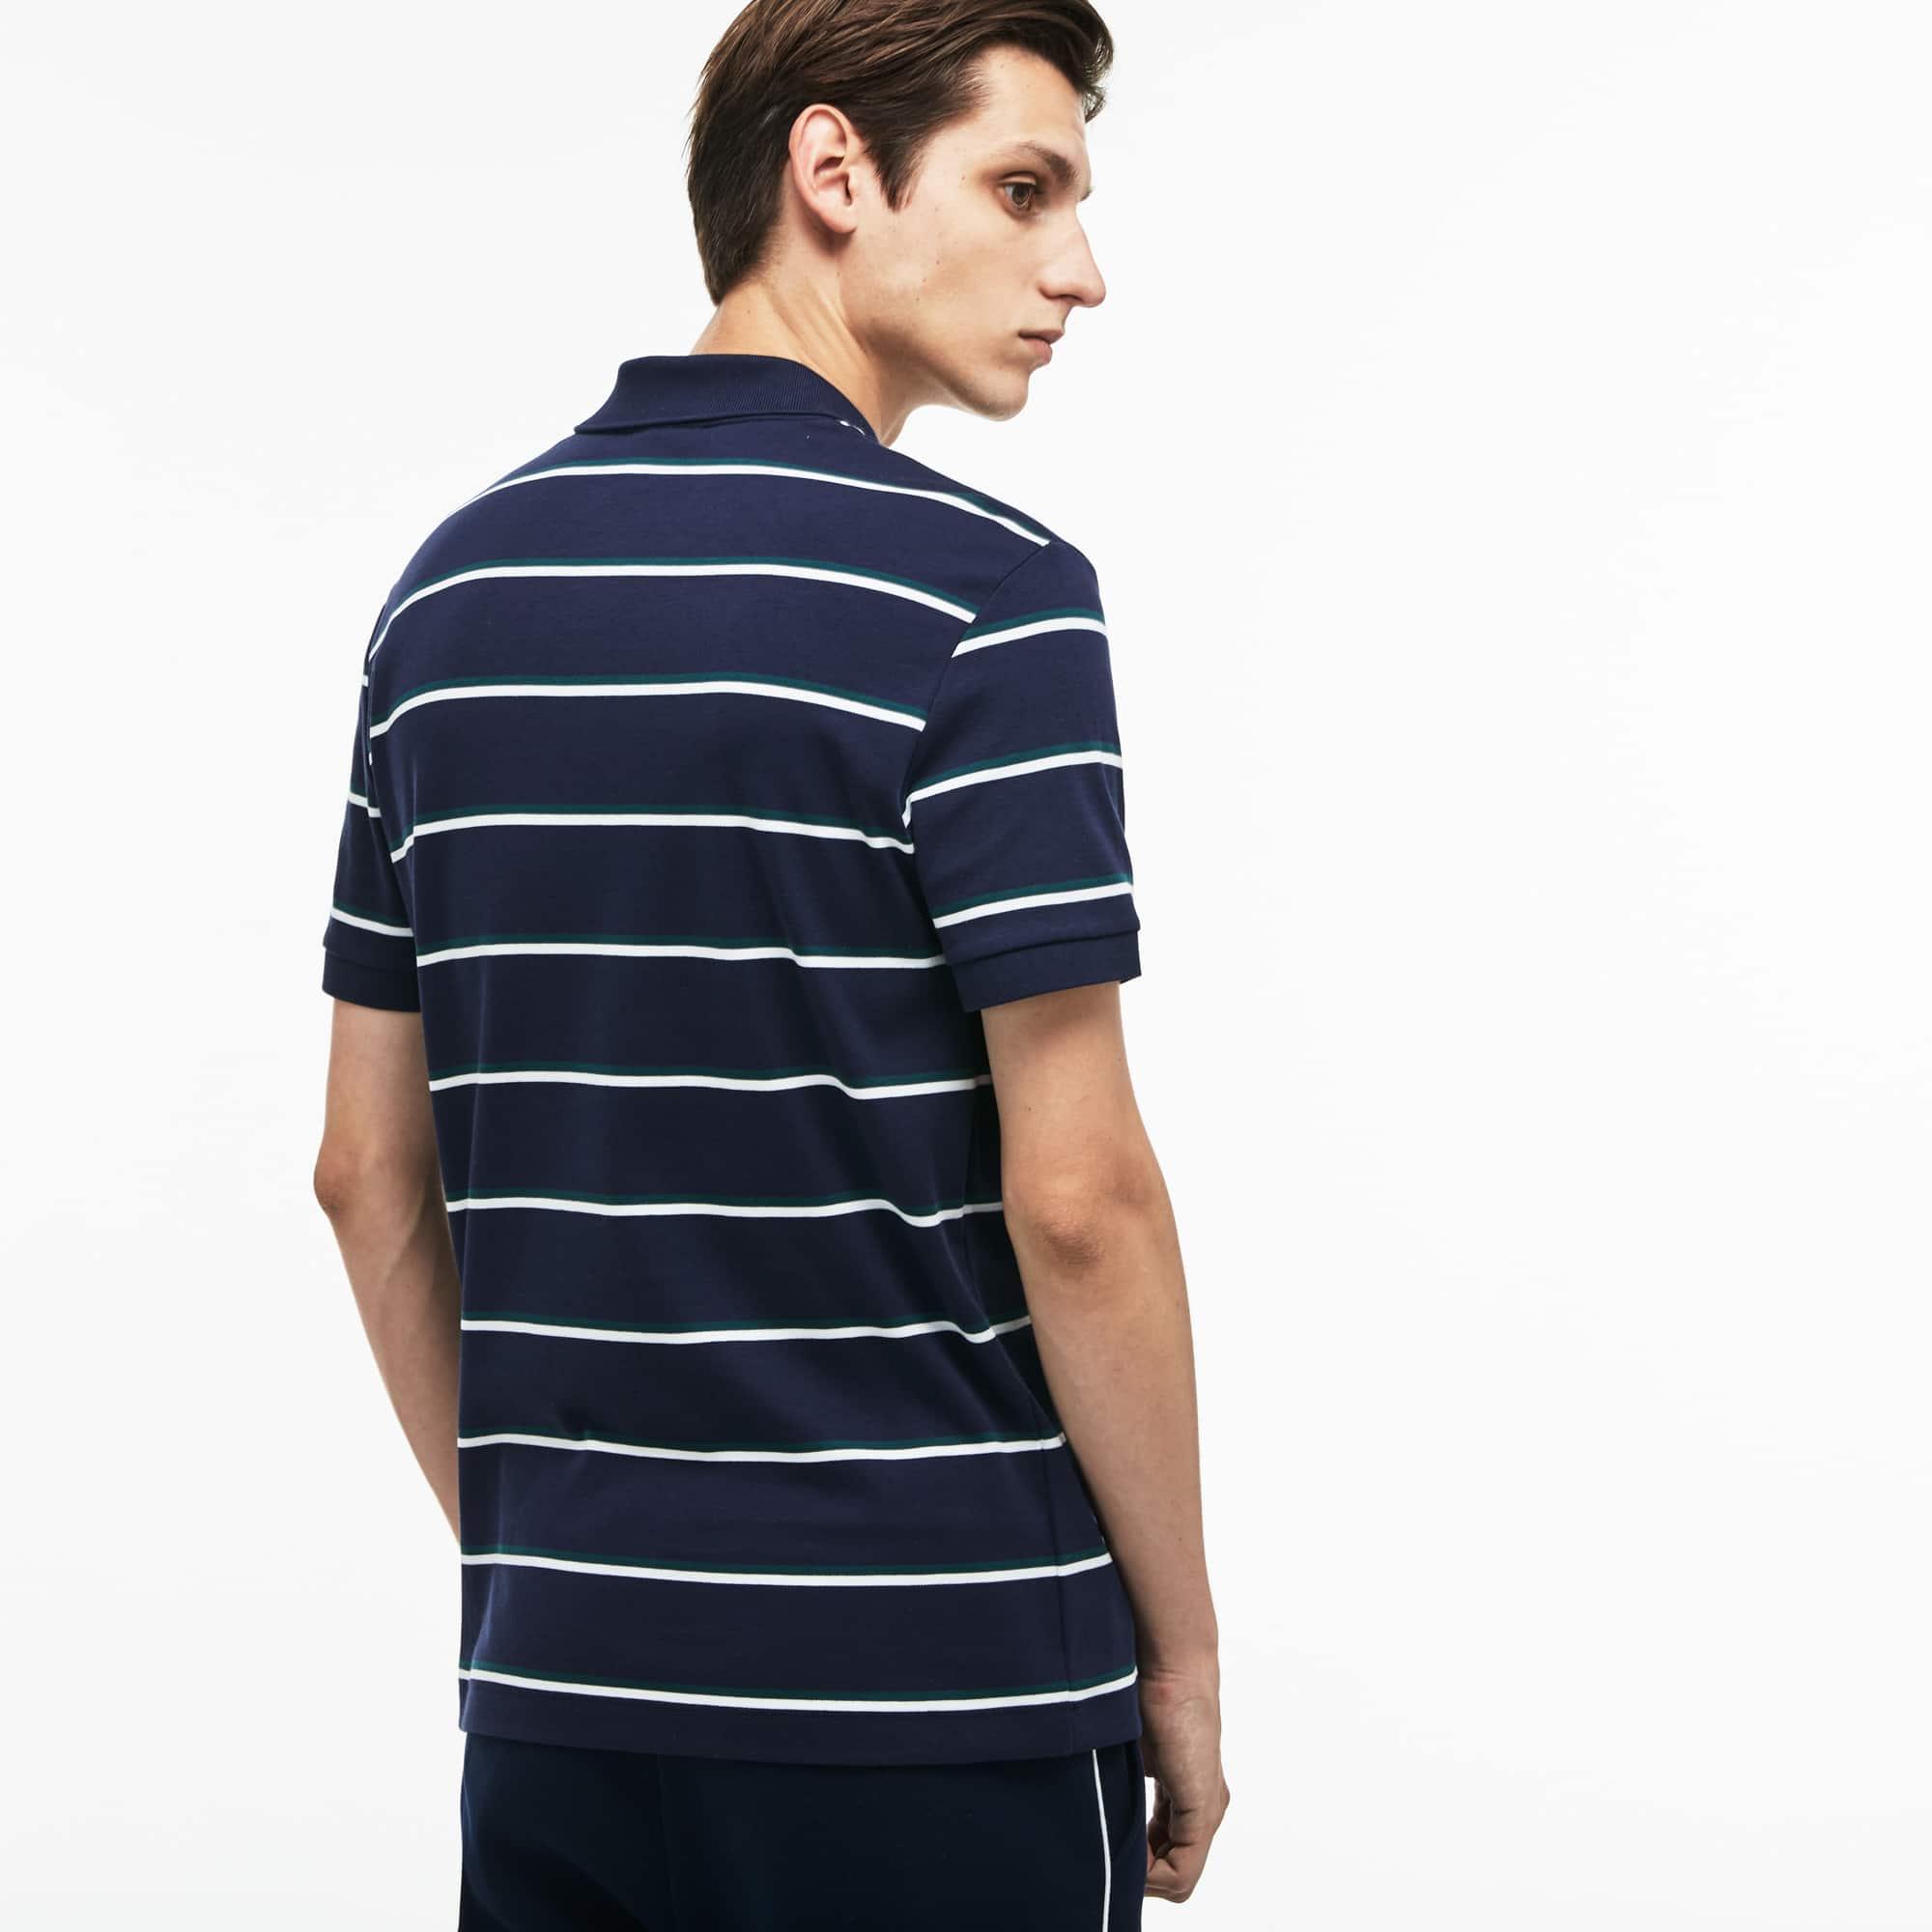 dc53e3ec7b2b Camisa polo masculina Regular Fit listrada | LACOSTE